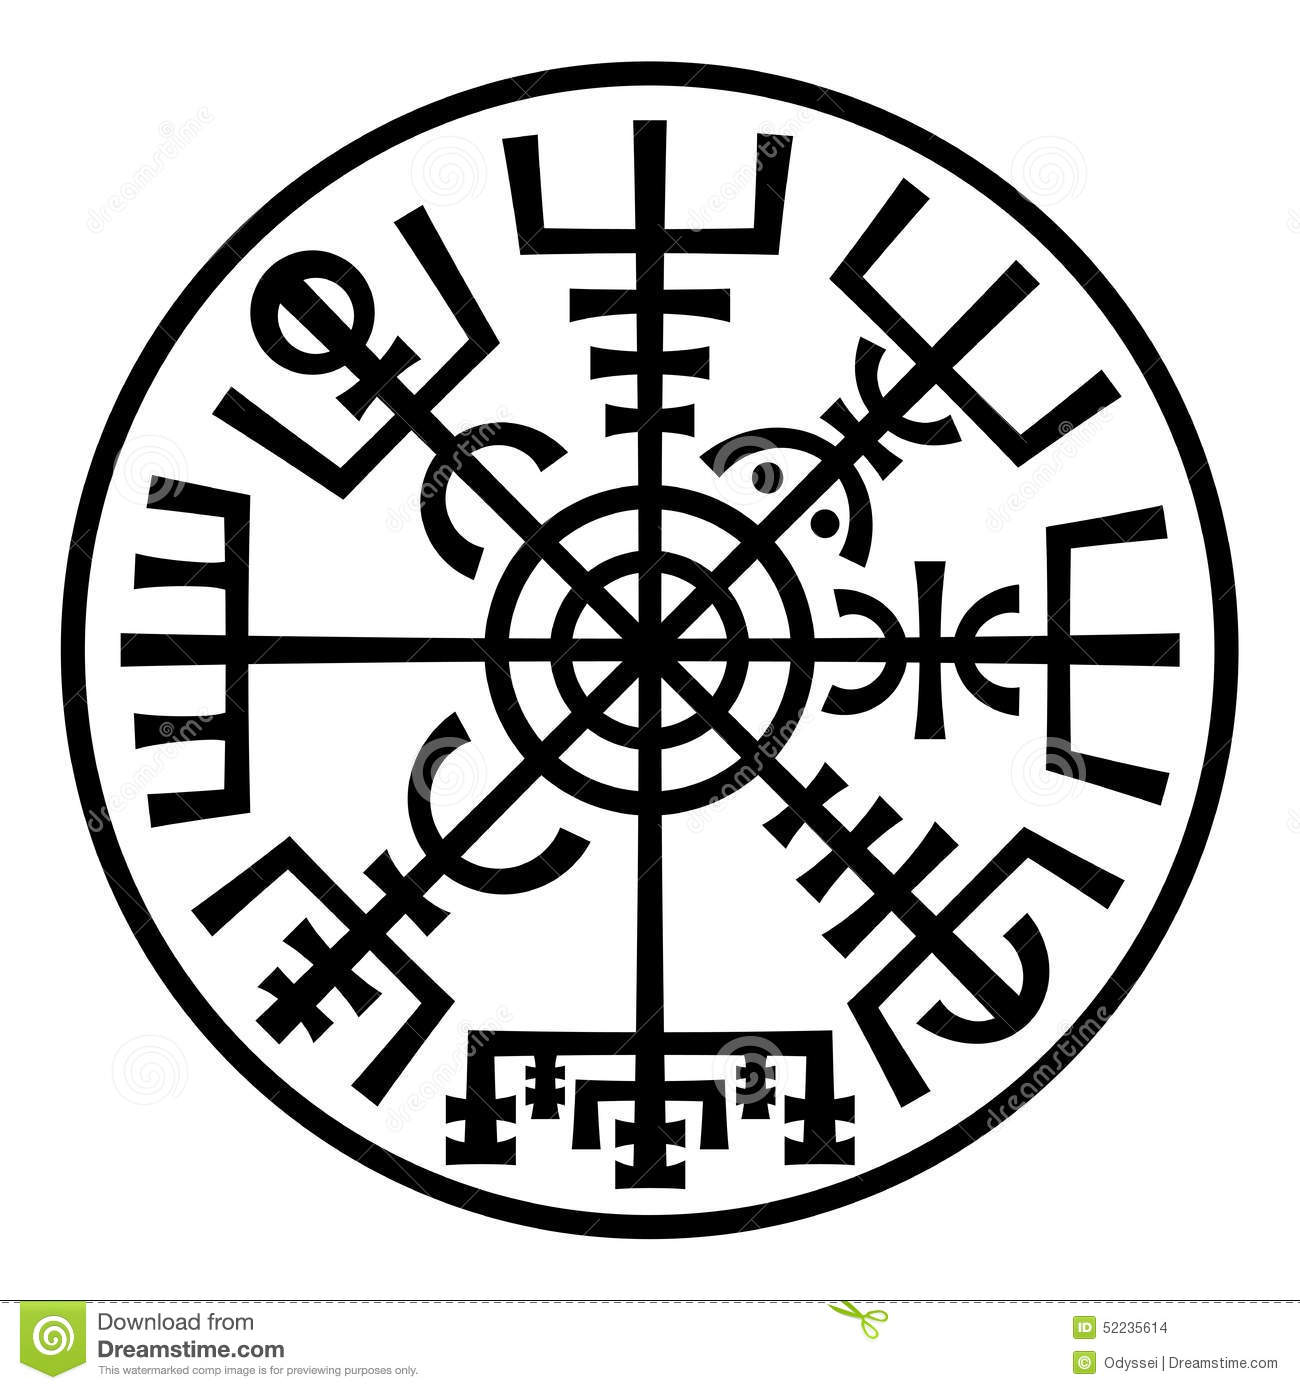 vegvisir-magic-compass-vikings-runic-talisman-ring-navigation-runescript-ancient-medieval-icelandic-manuscript-52235614.jpg